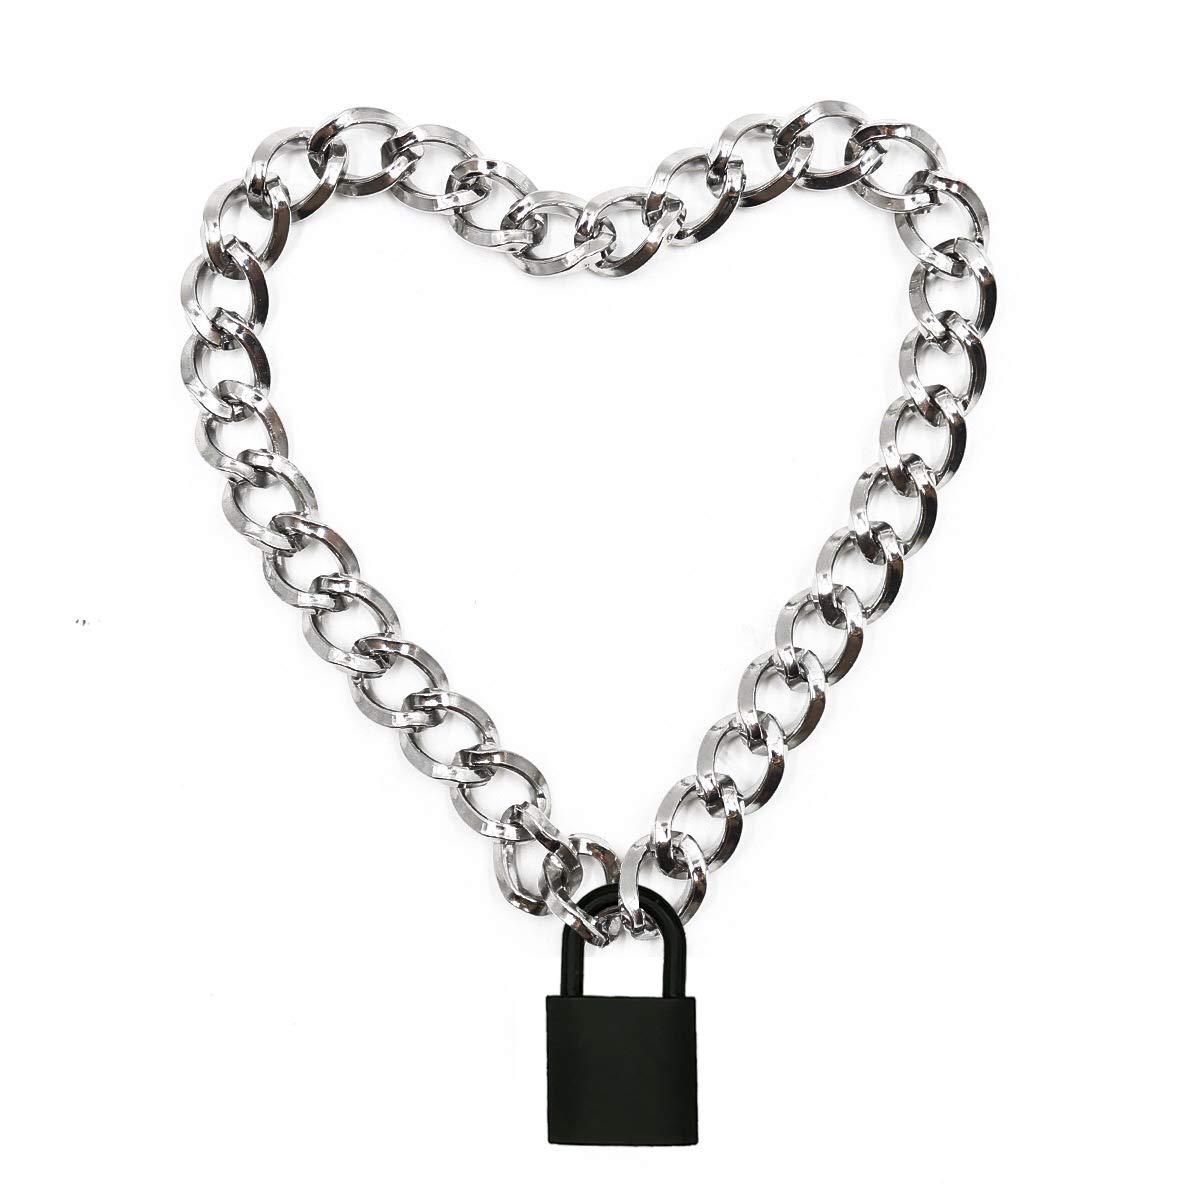 Lover Heart Padlock Necklace Metal Padlock Collar Choker for Men Women with Lock and Key 16in (C)